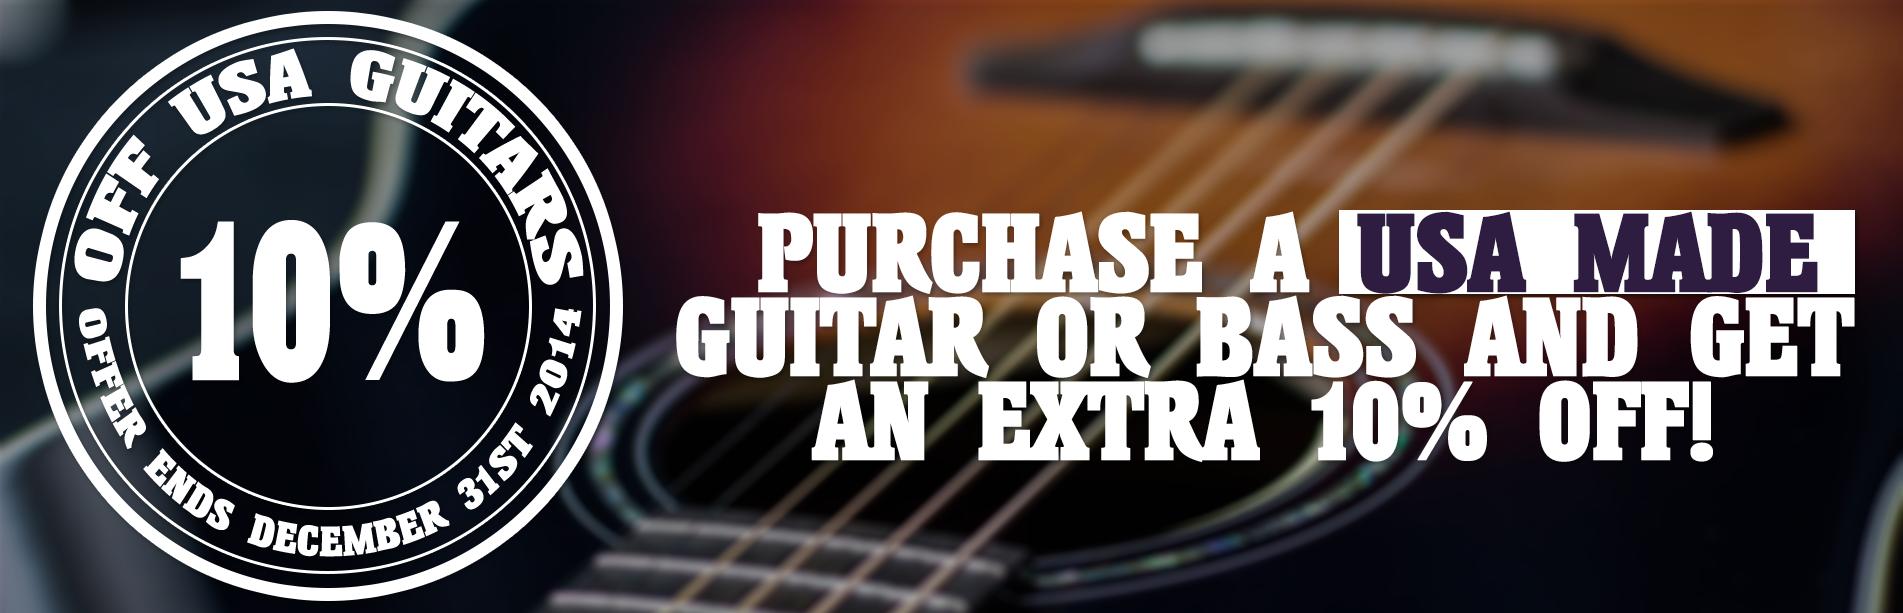 10-Percent-Off-USA-Guitars